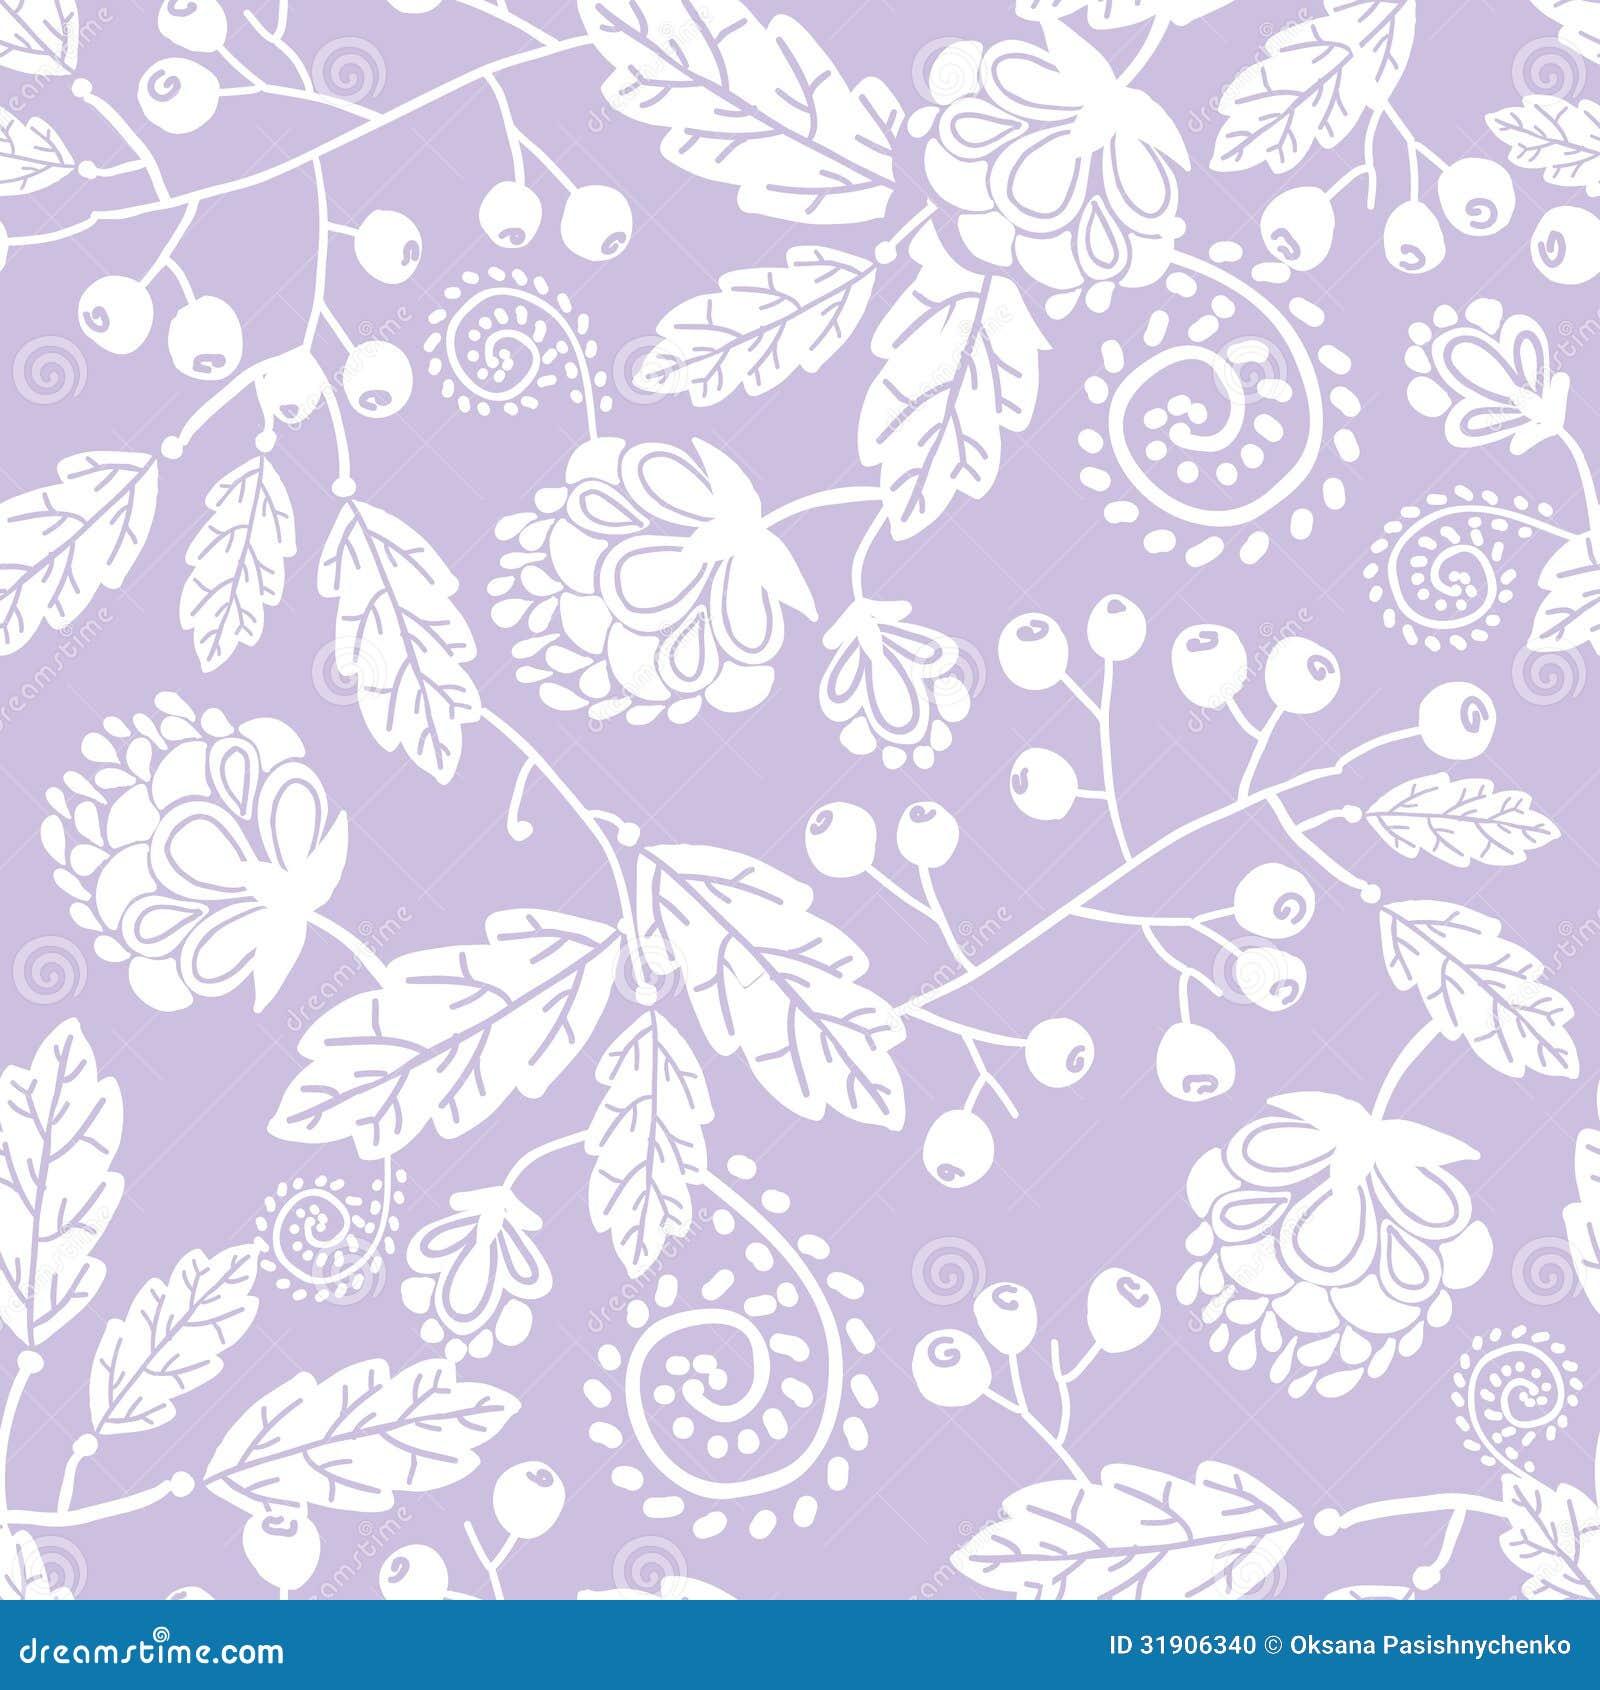 Purple Line Art Flowers Seamless Pattern Stock Vector - Illustration ... for Light Purple Background Pattern  1lp1fsj